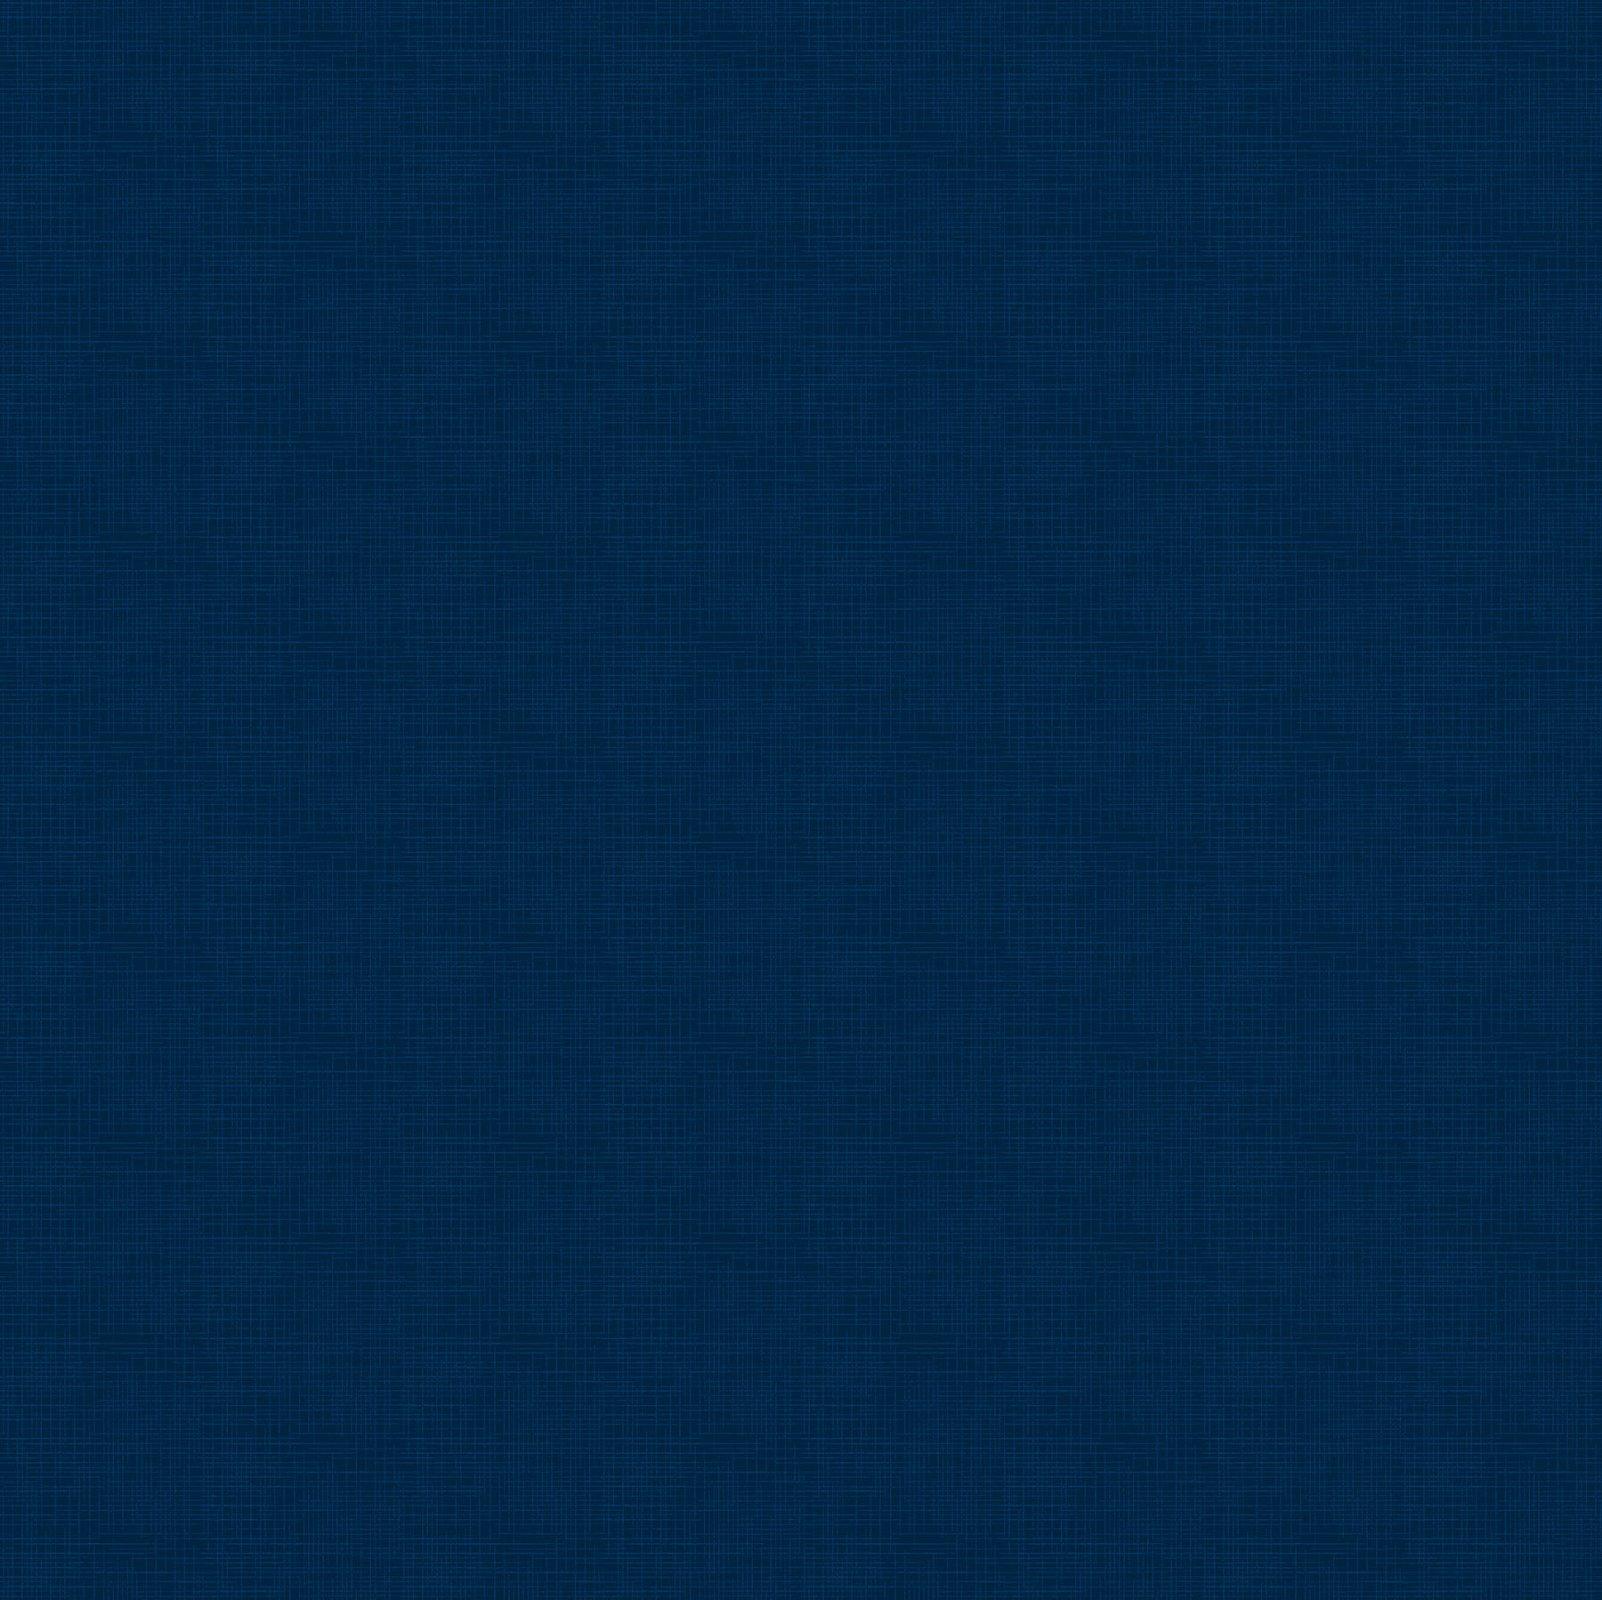 Dublin Moody Blues 9040-49